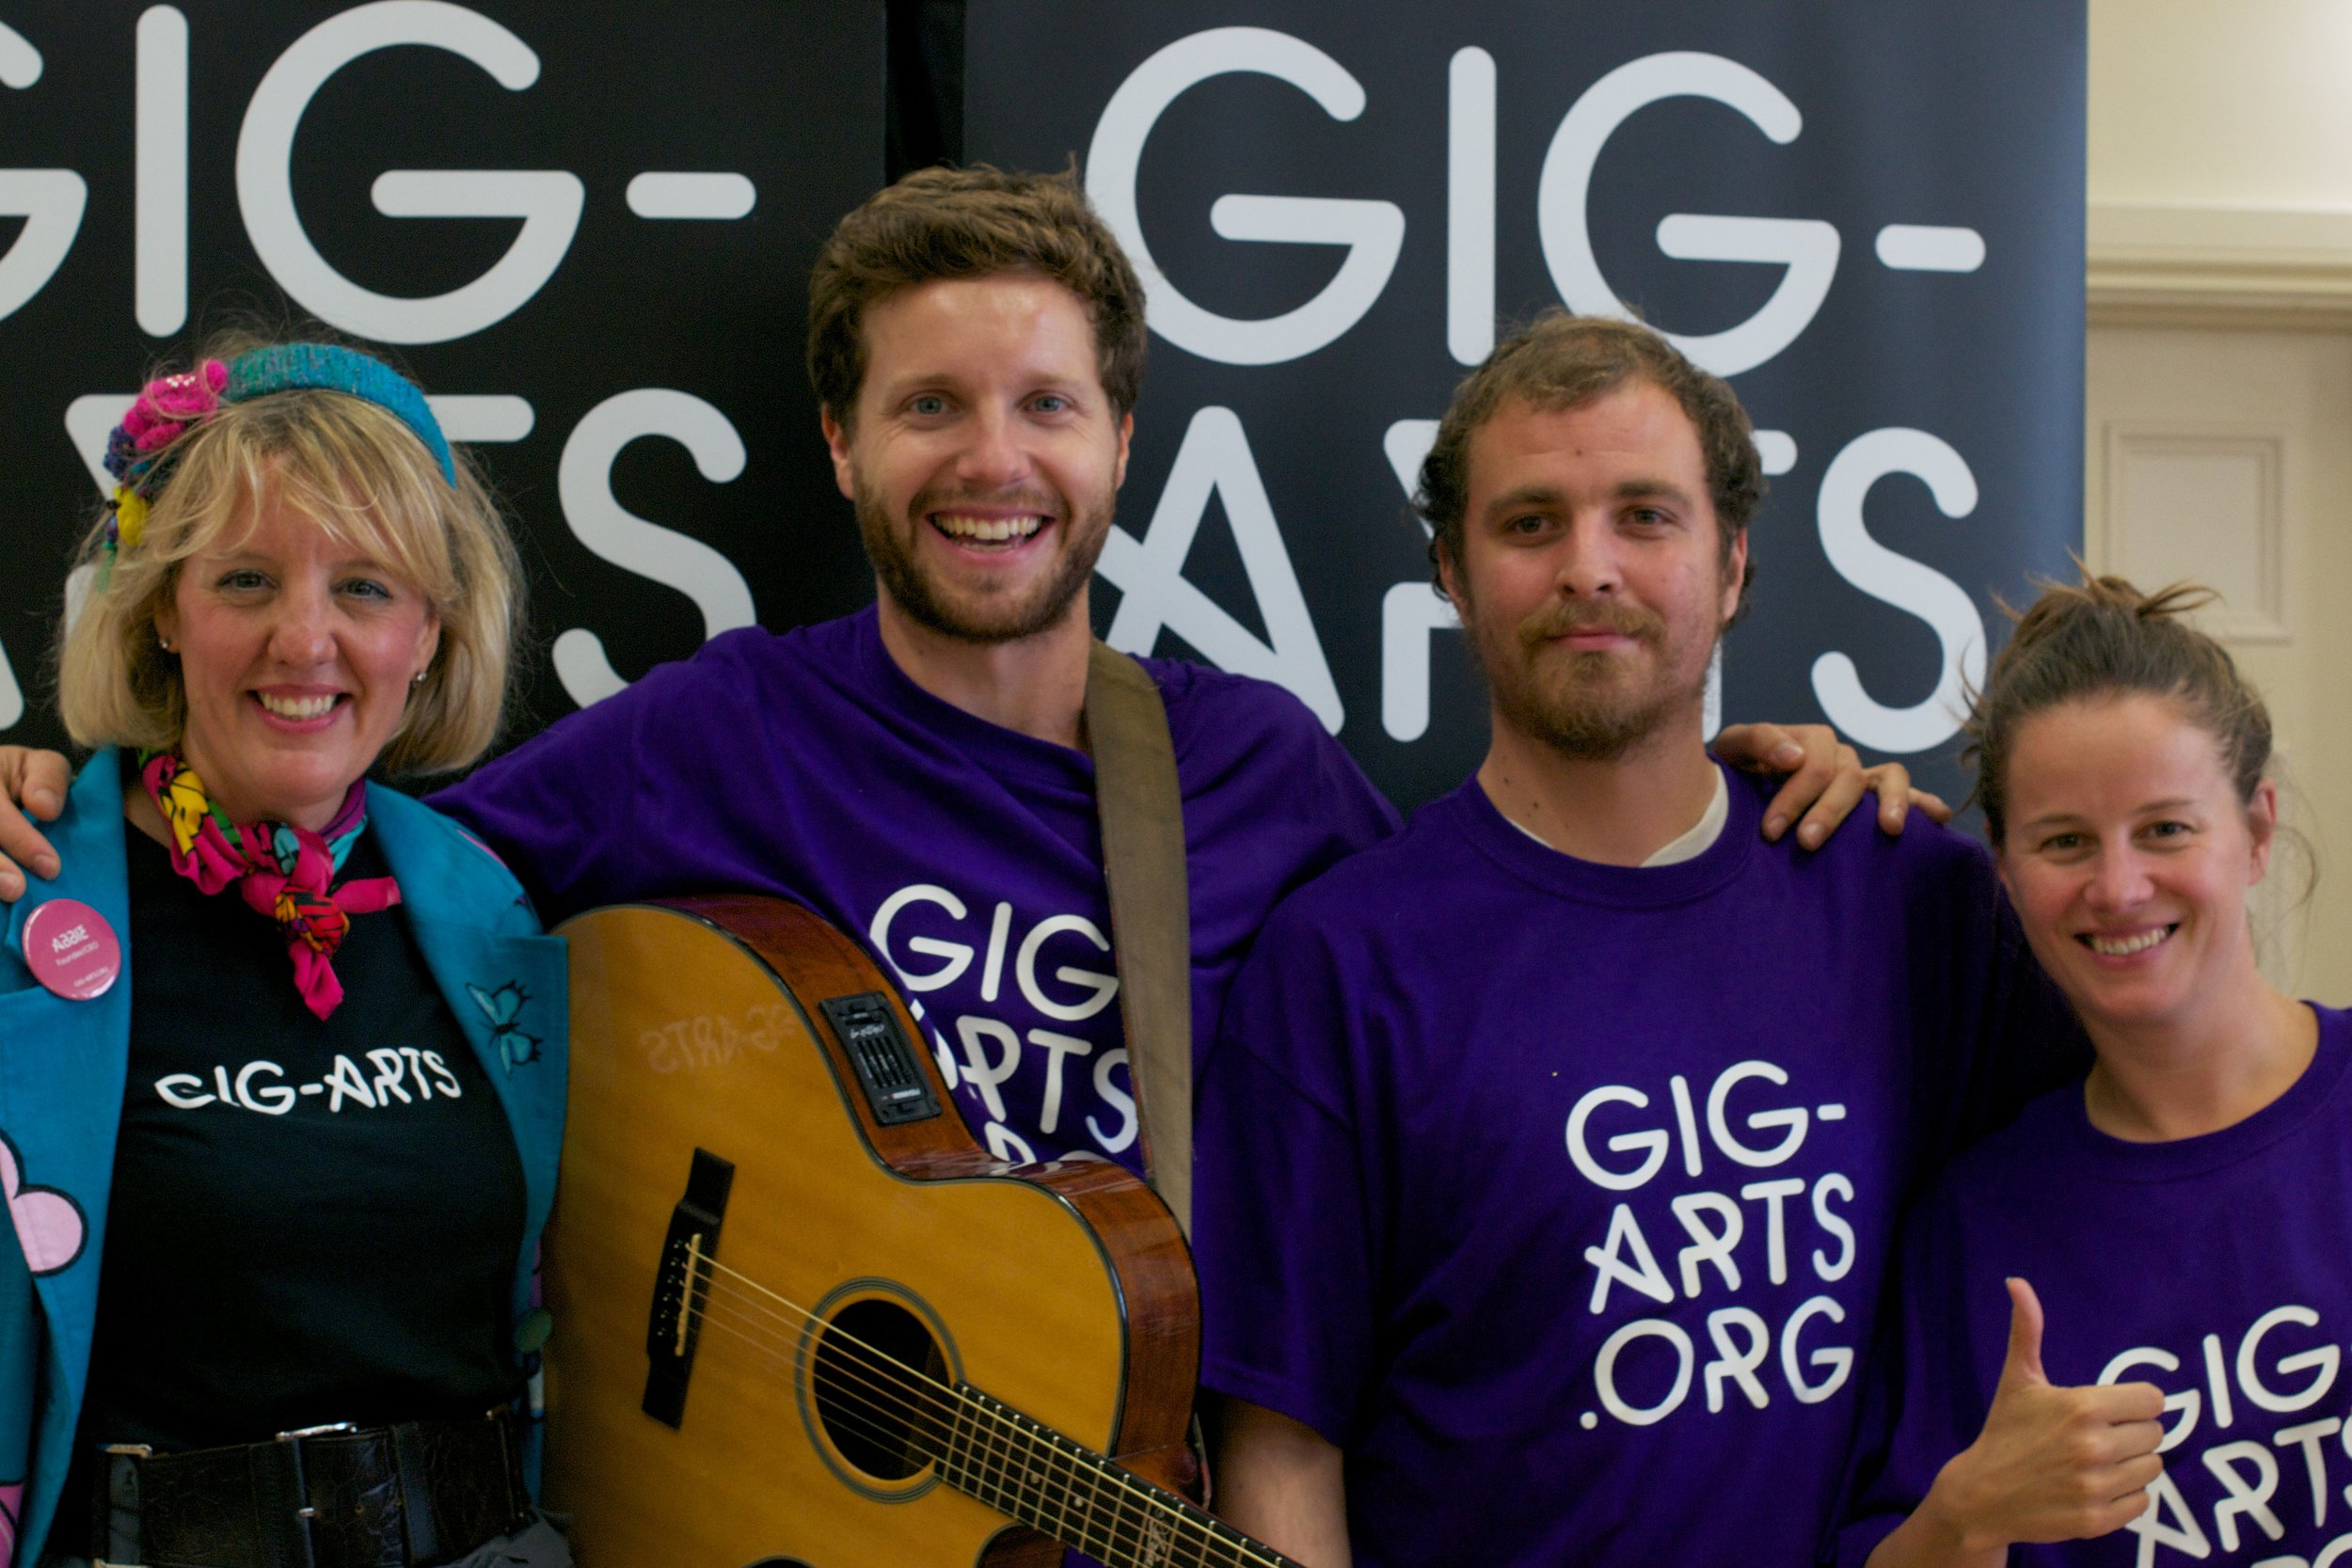 Meet the Gig-Arts Team - Abbie, Jem, Ryan and Grace.